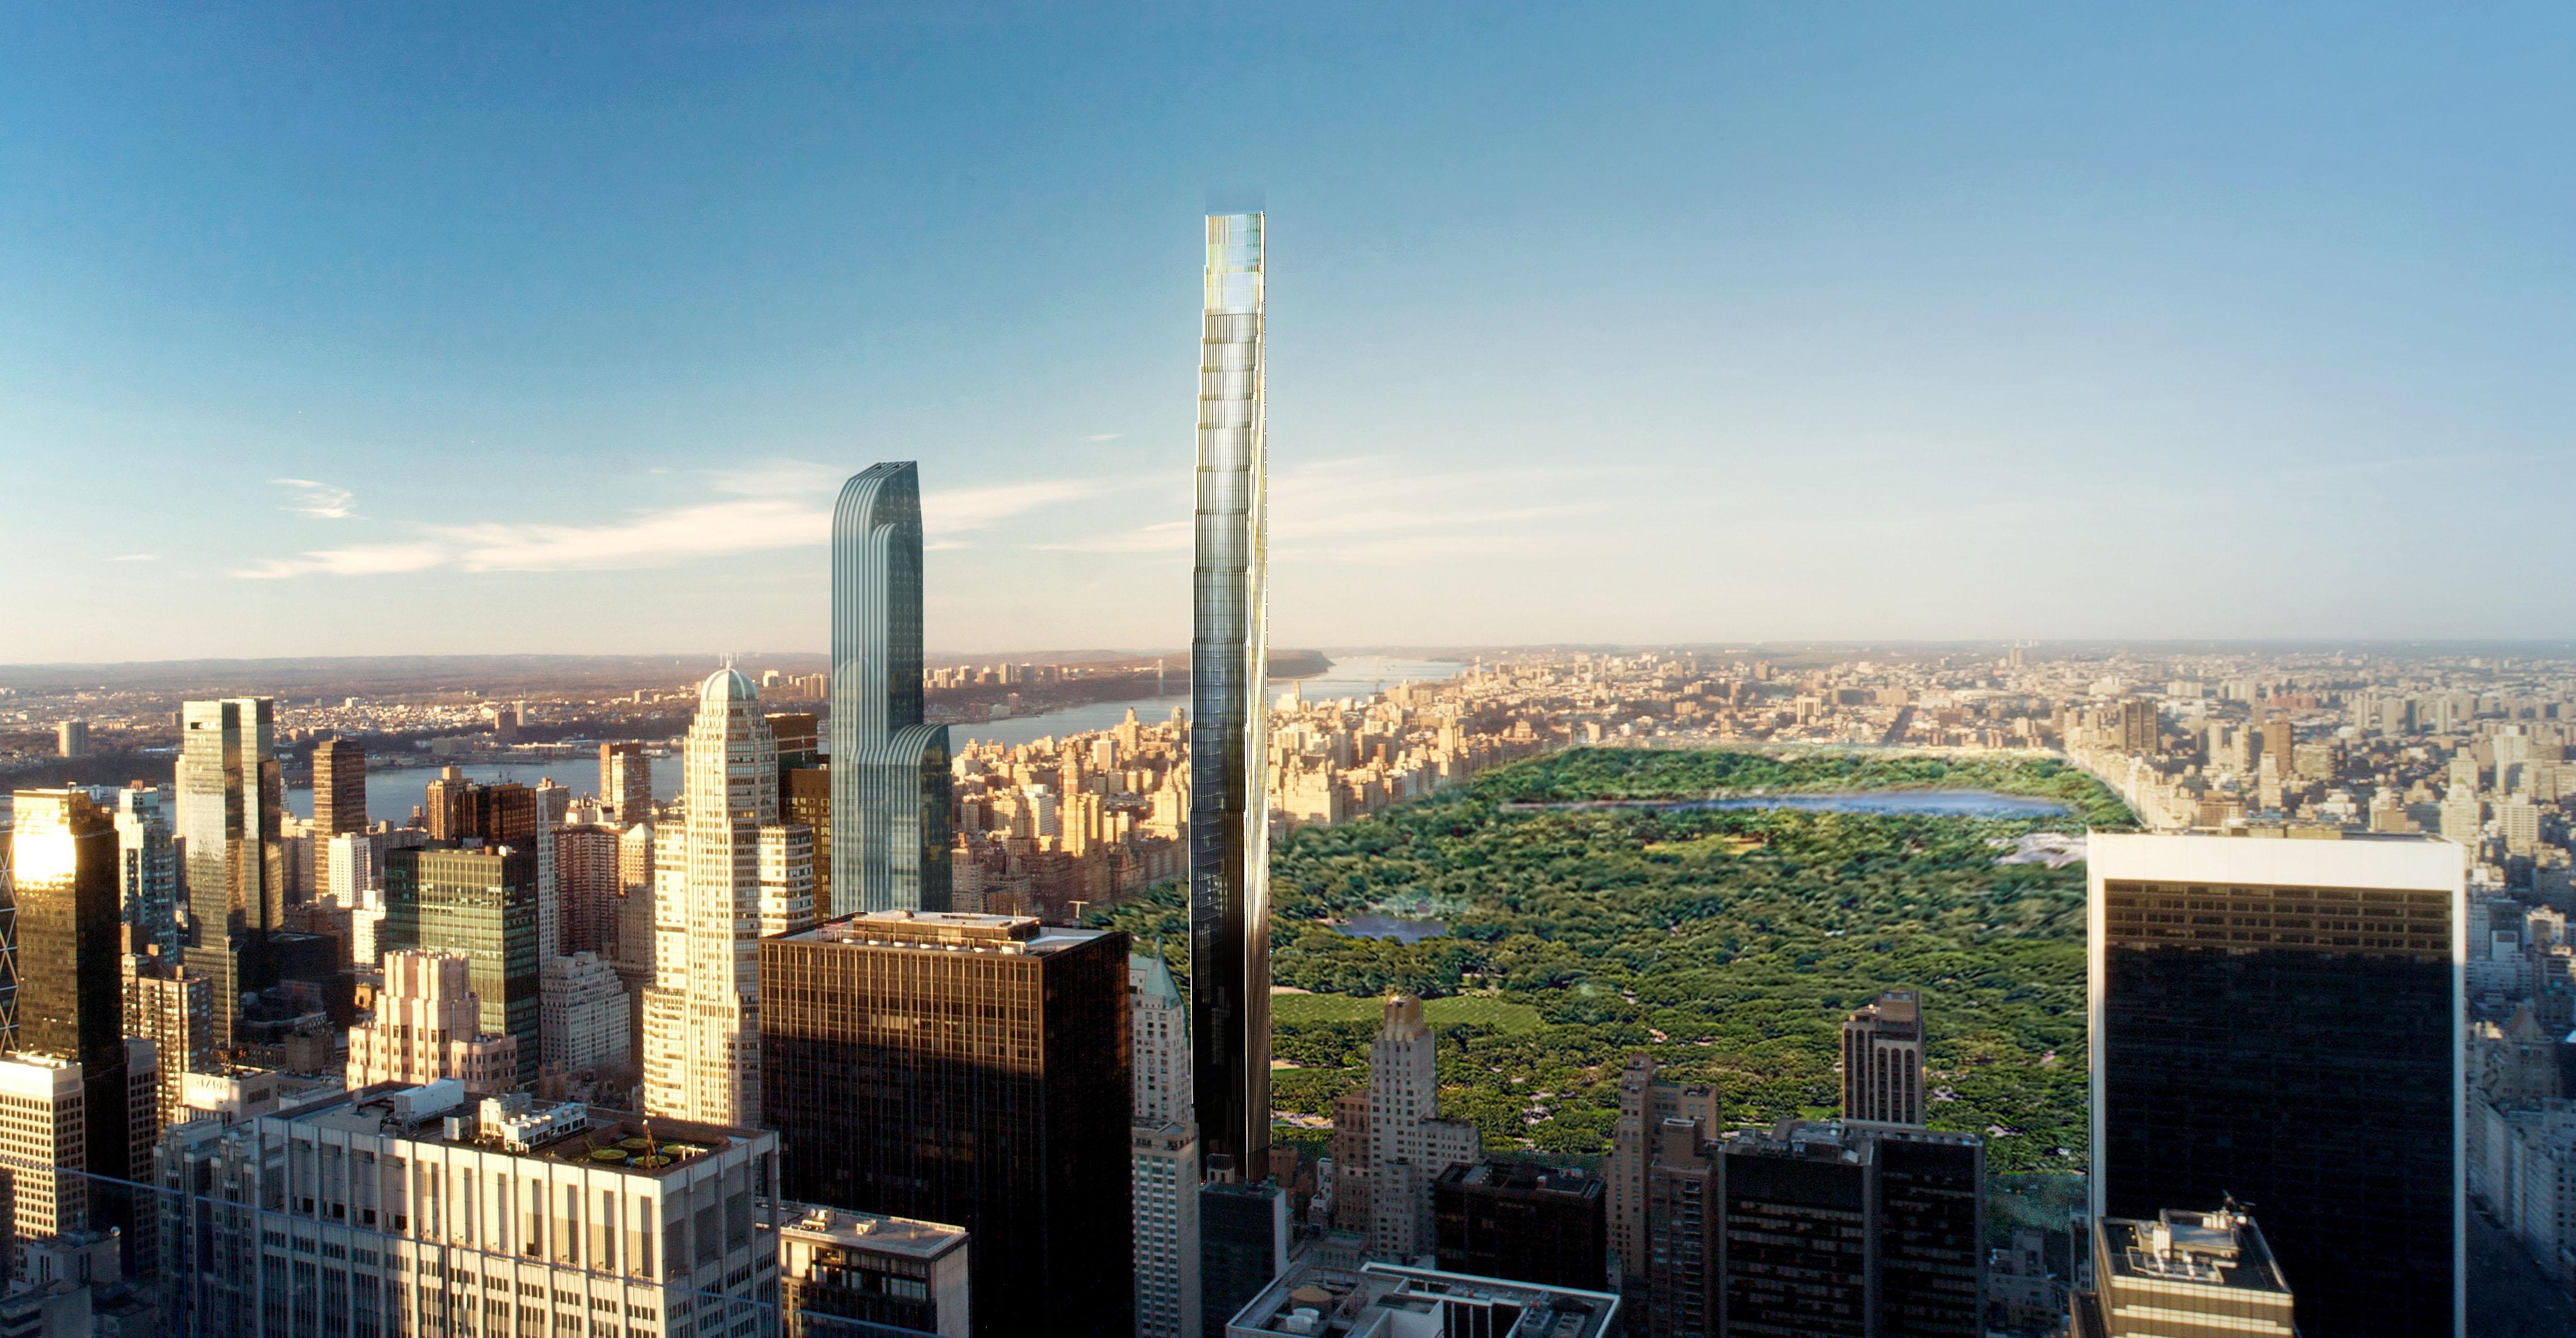 111 West 57. Source: SHoP Architects. (Fair use.)